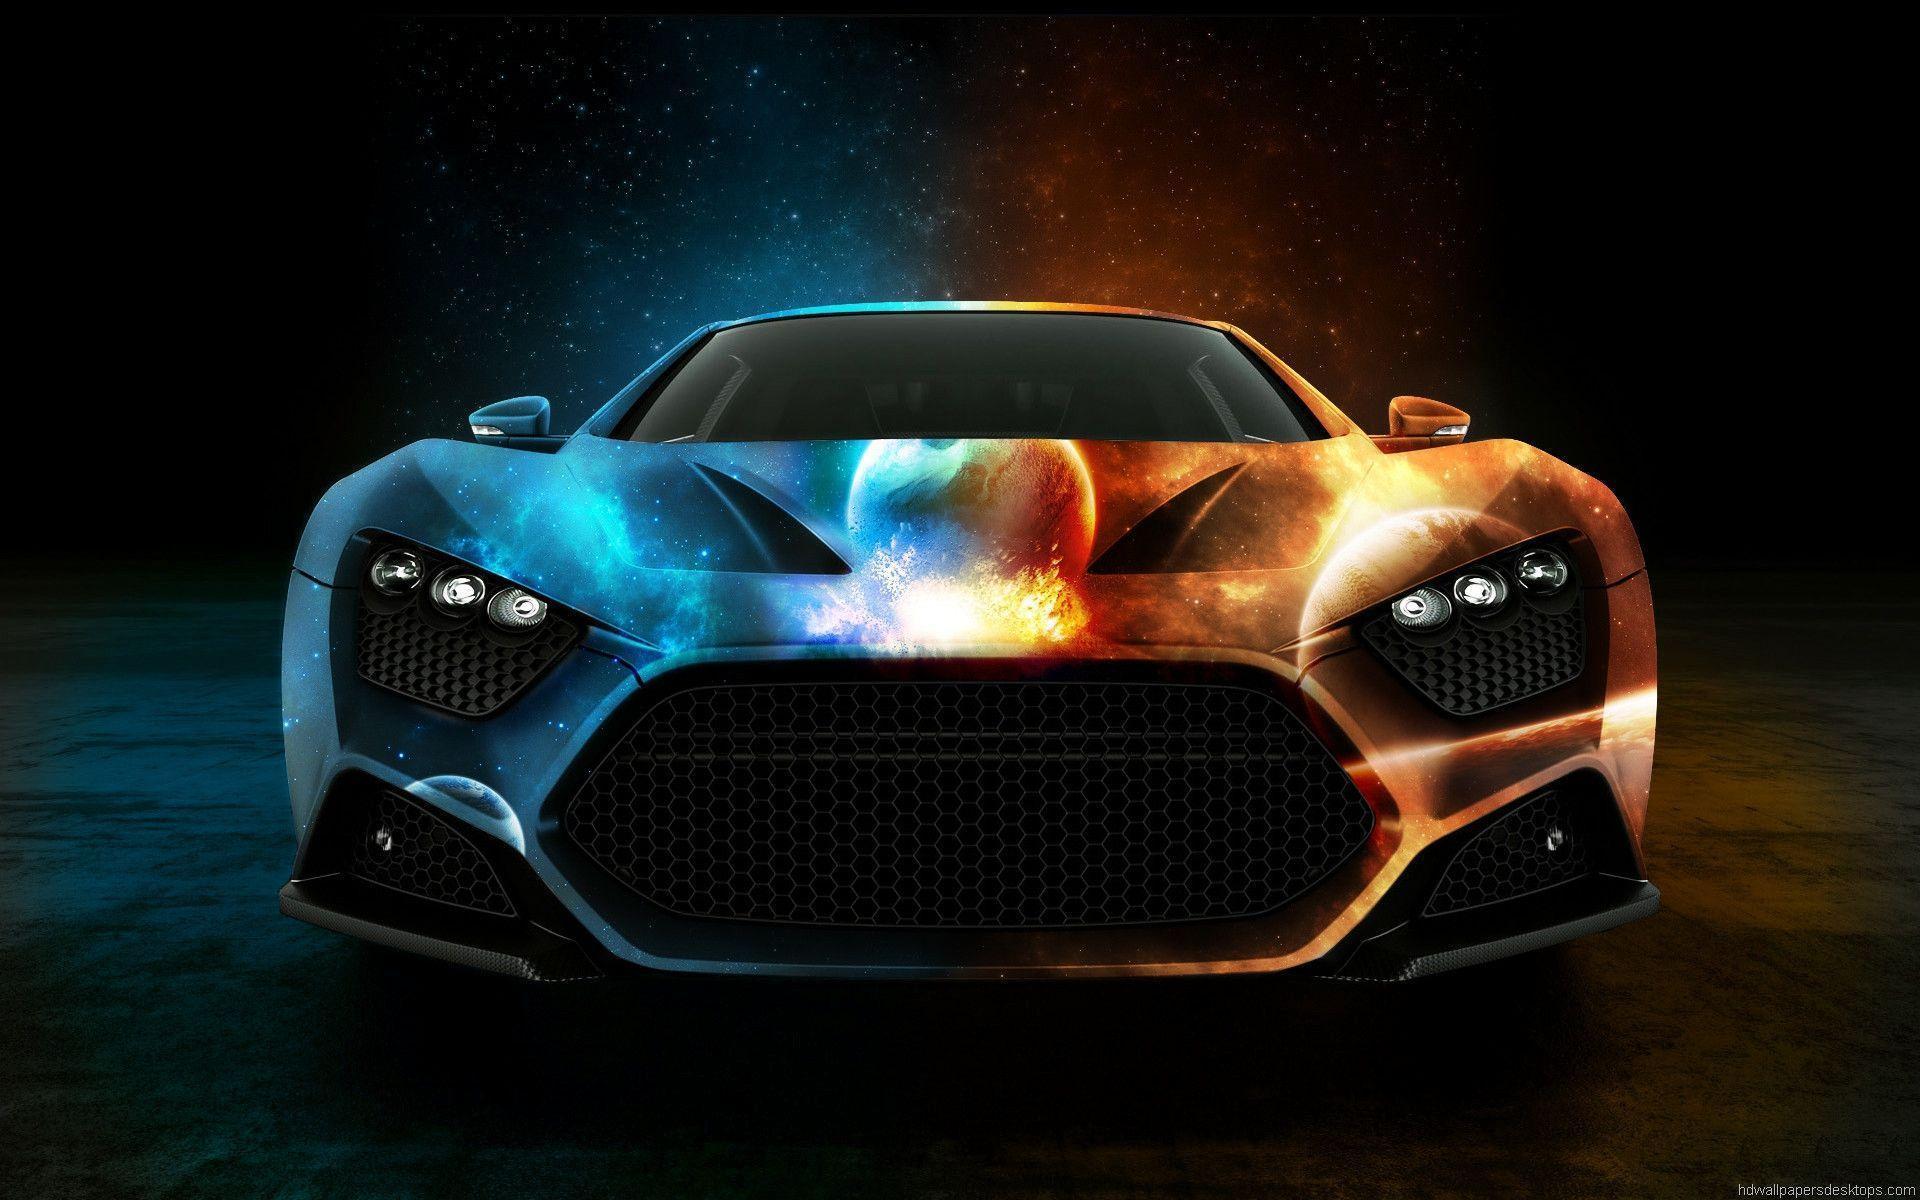 Full Hd Car Wallpapers Top Free Full Hd Car Backgrounds Wallpaperaccess